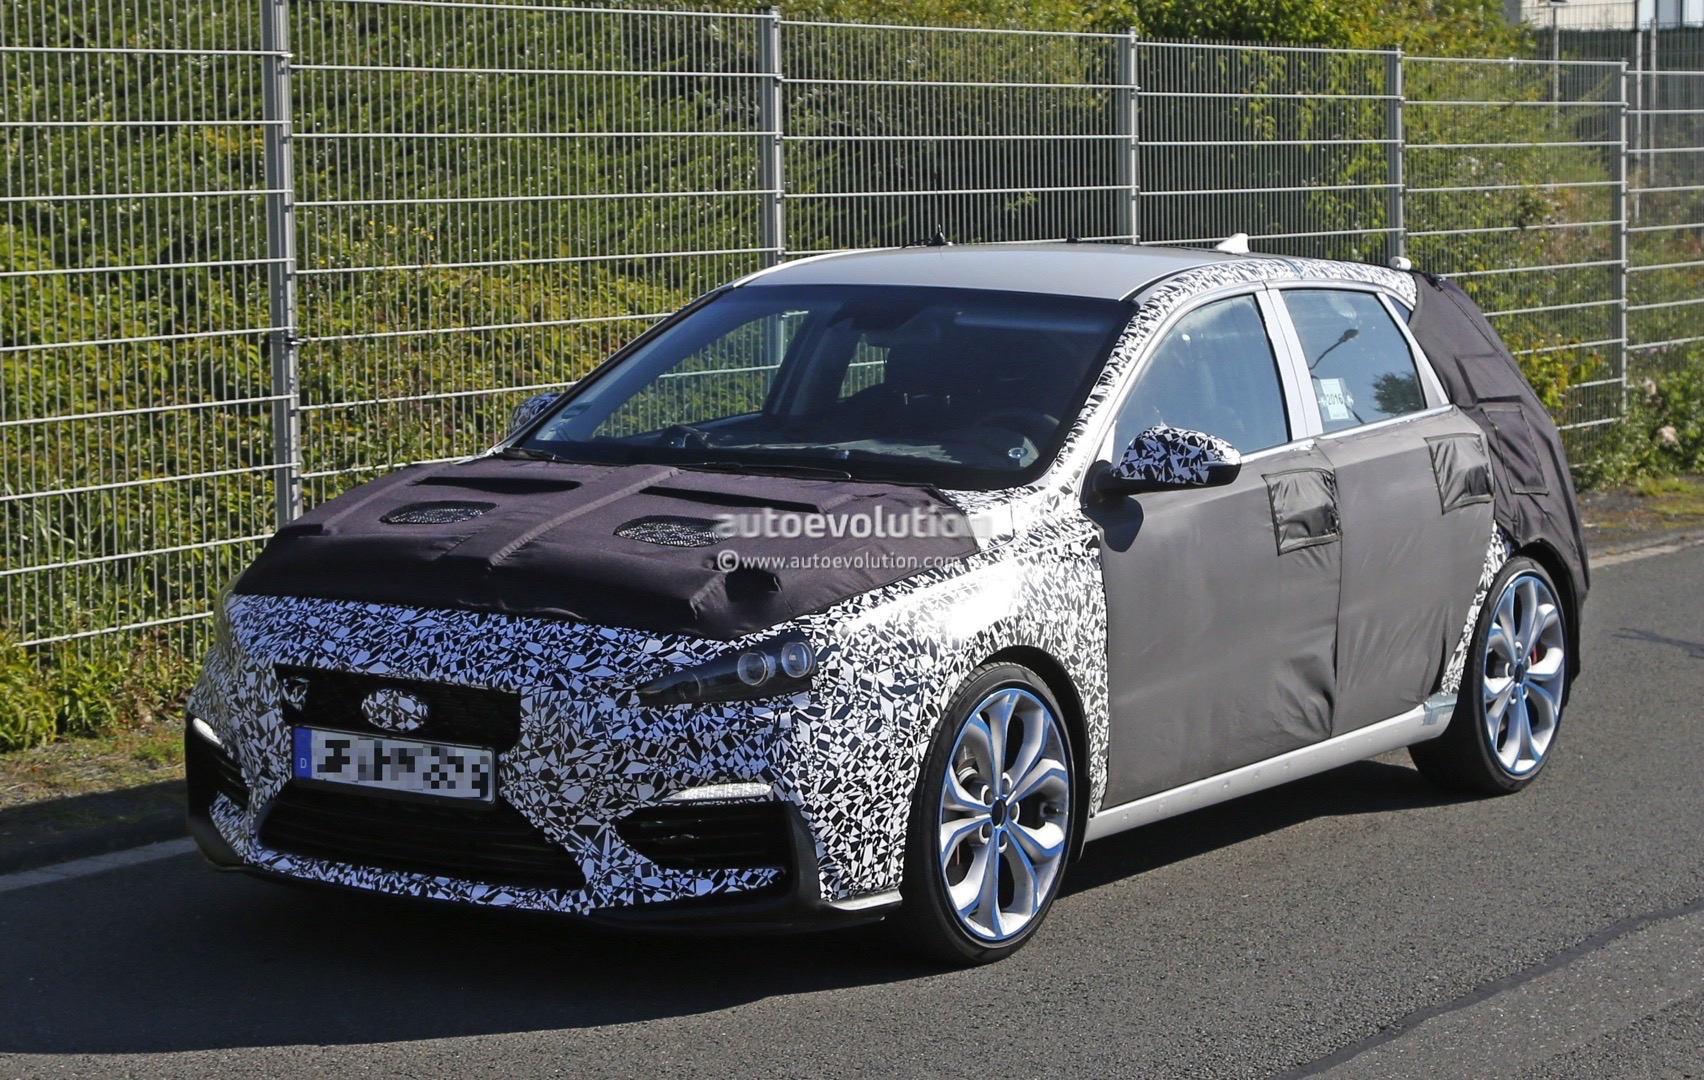 2017 Hyundai i30 N Shows More Skin In Latest Spy Shots ...